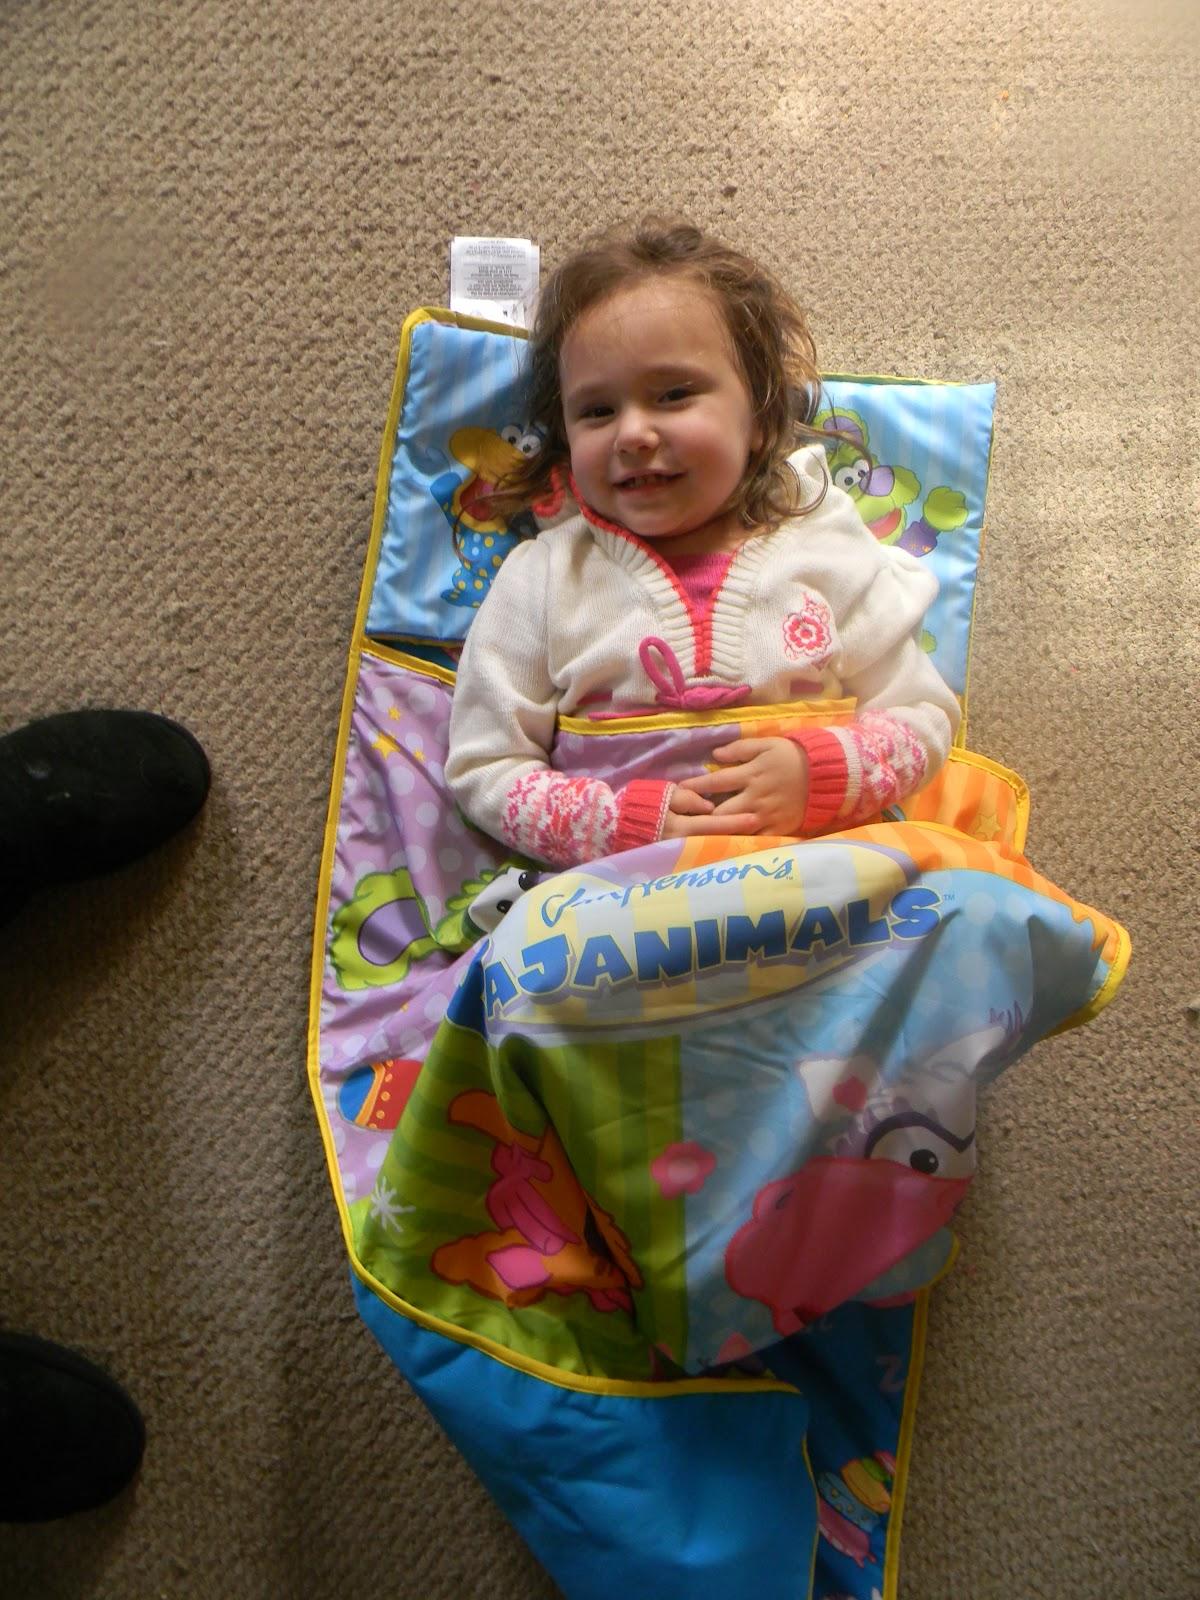 New Age Mama Pajanimals Snuggle Up Storymat From Tomy